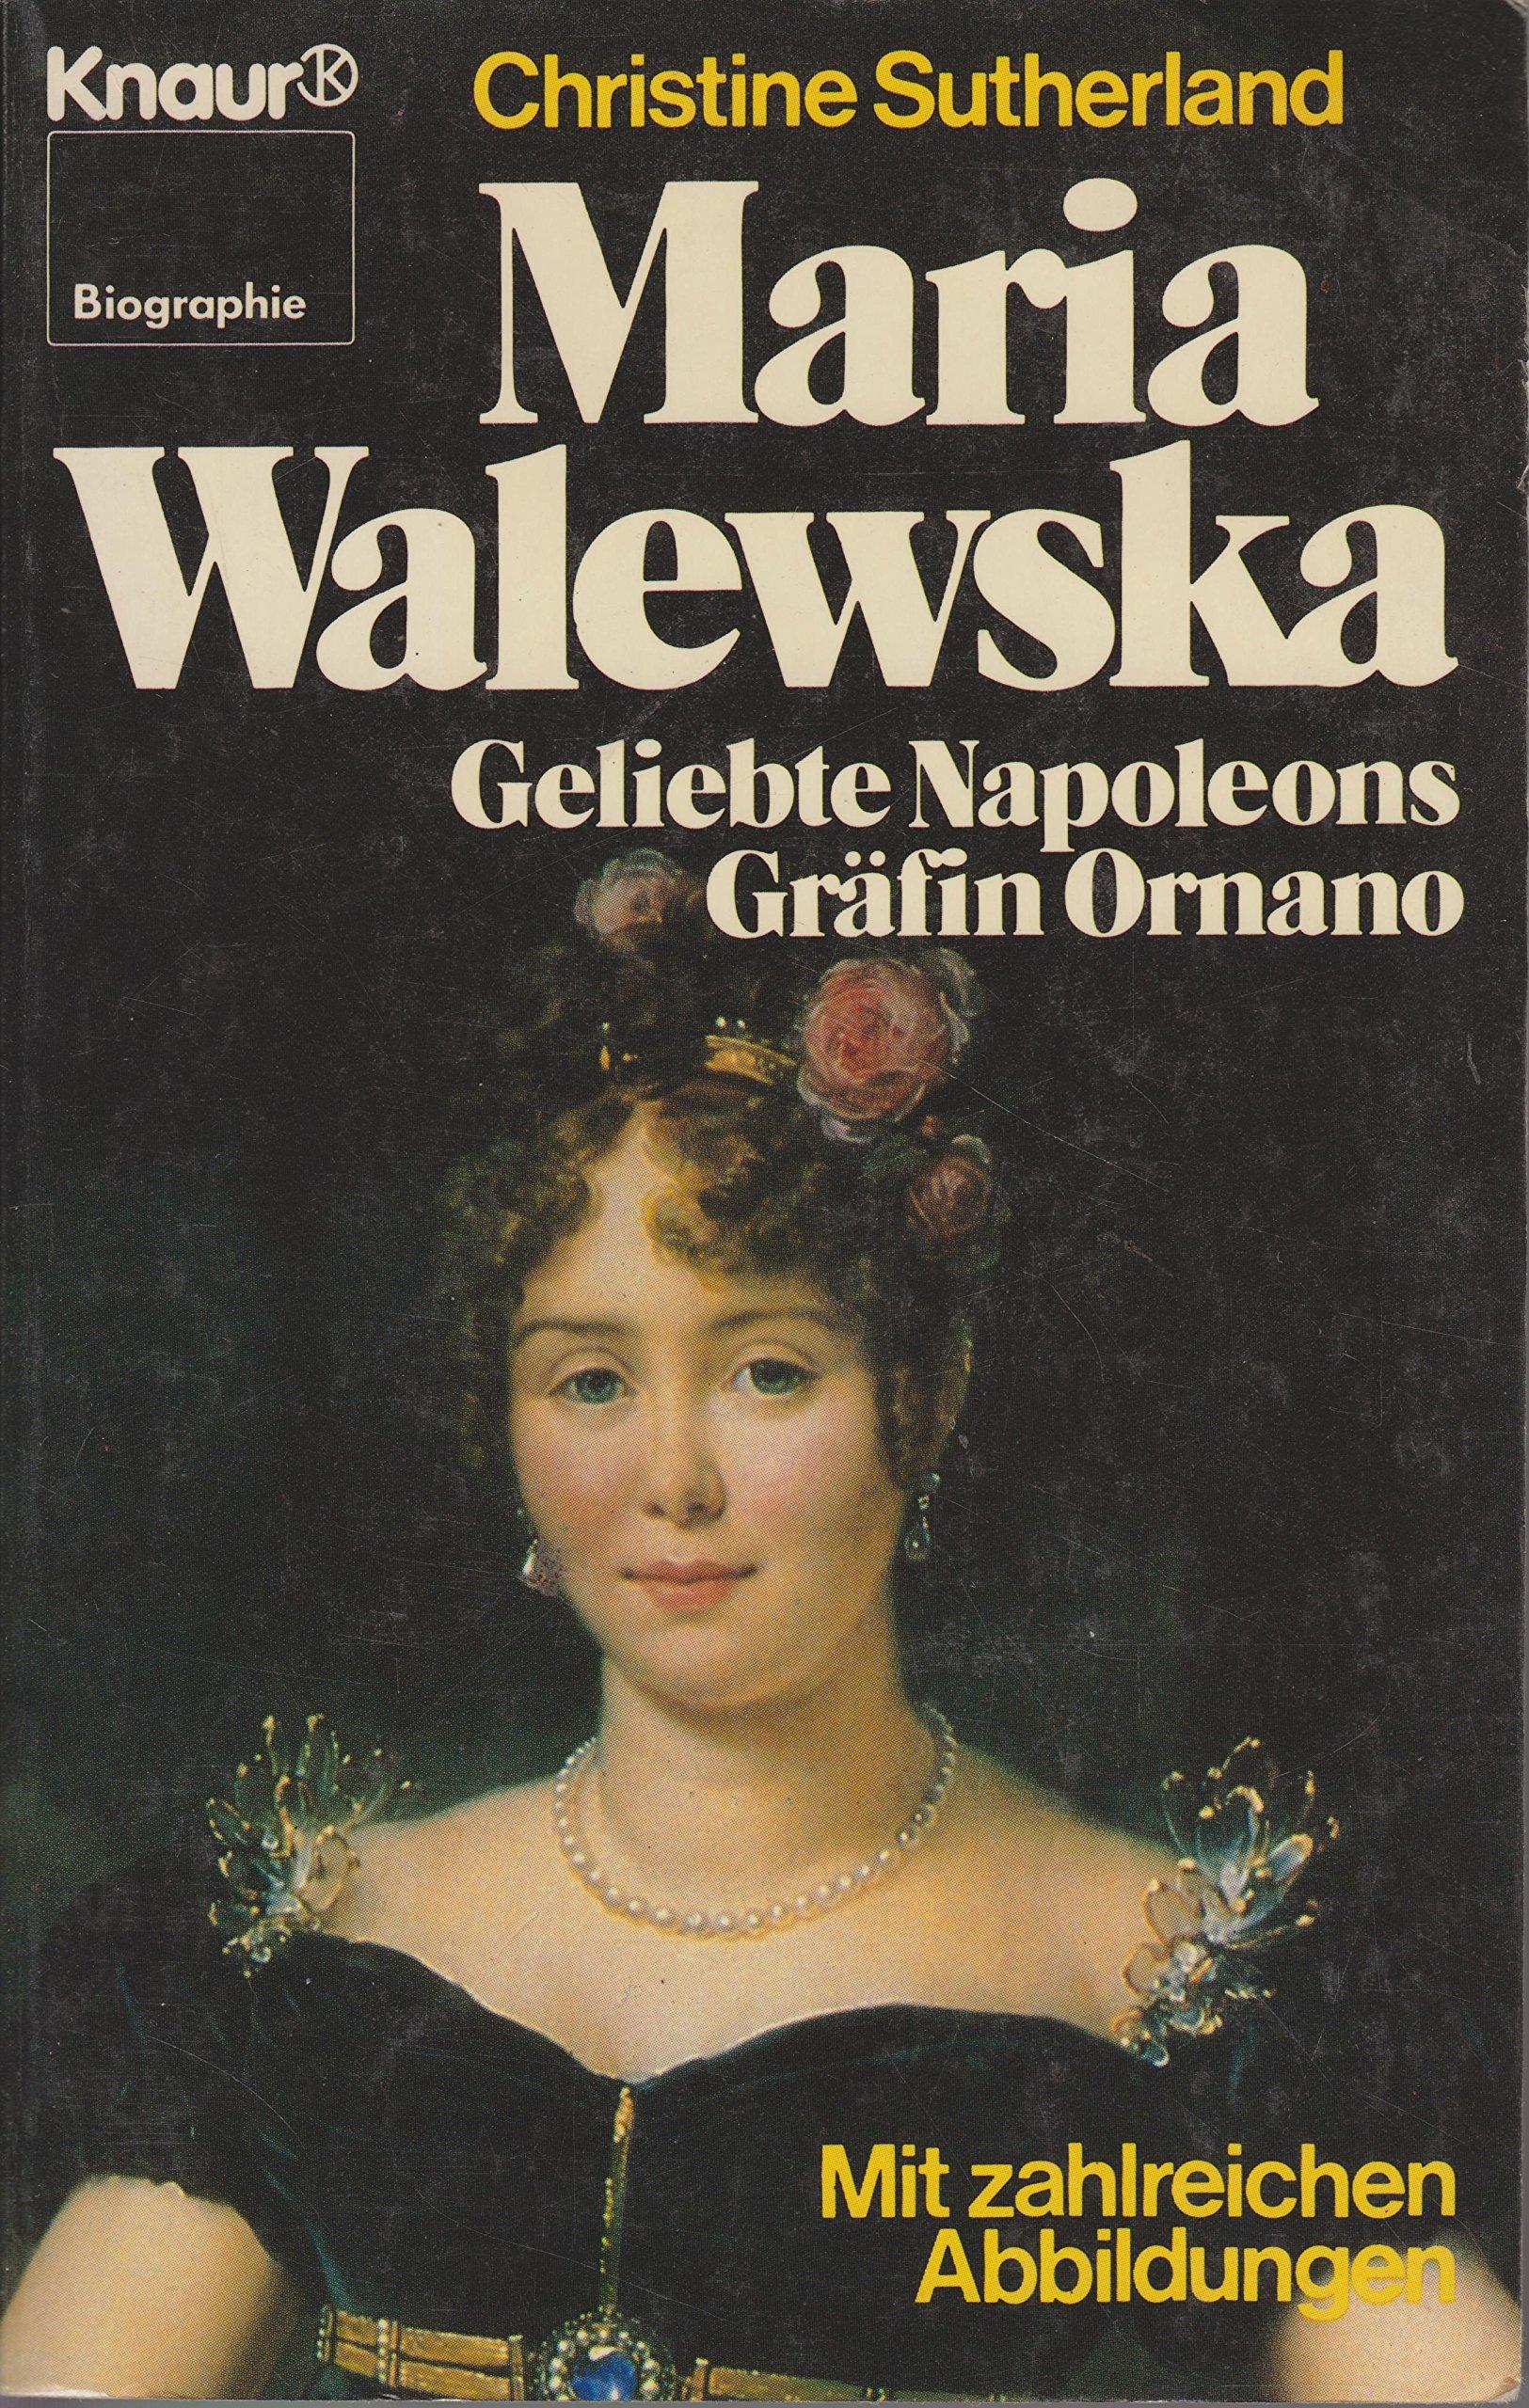 Maria Walewska. Geliebte Napoleons, Gräfin Ornano.